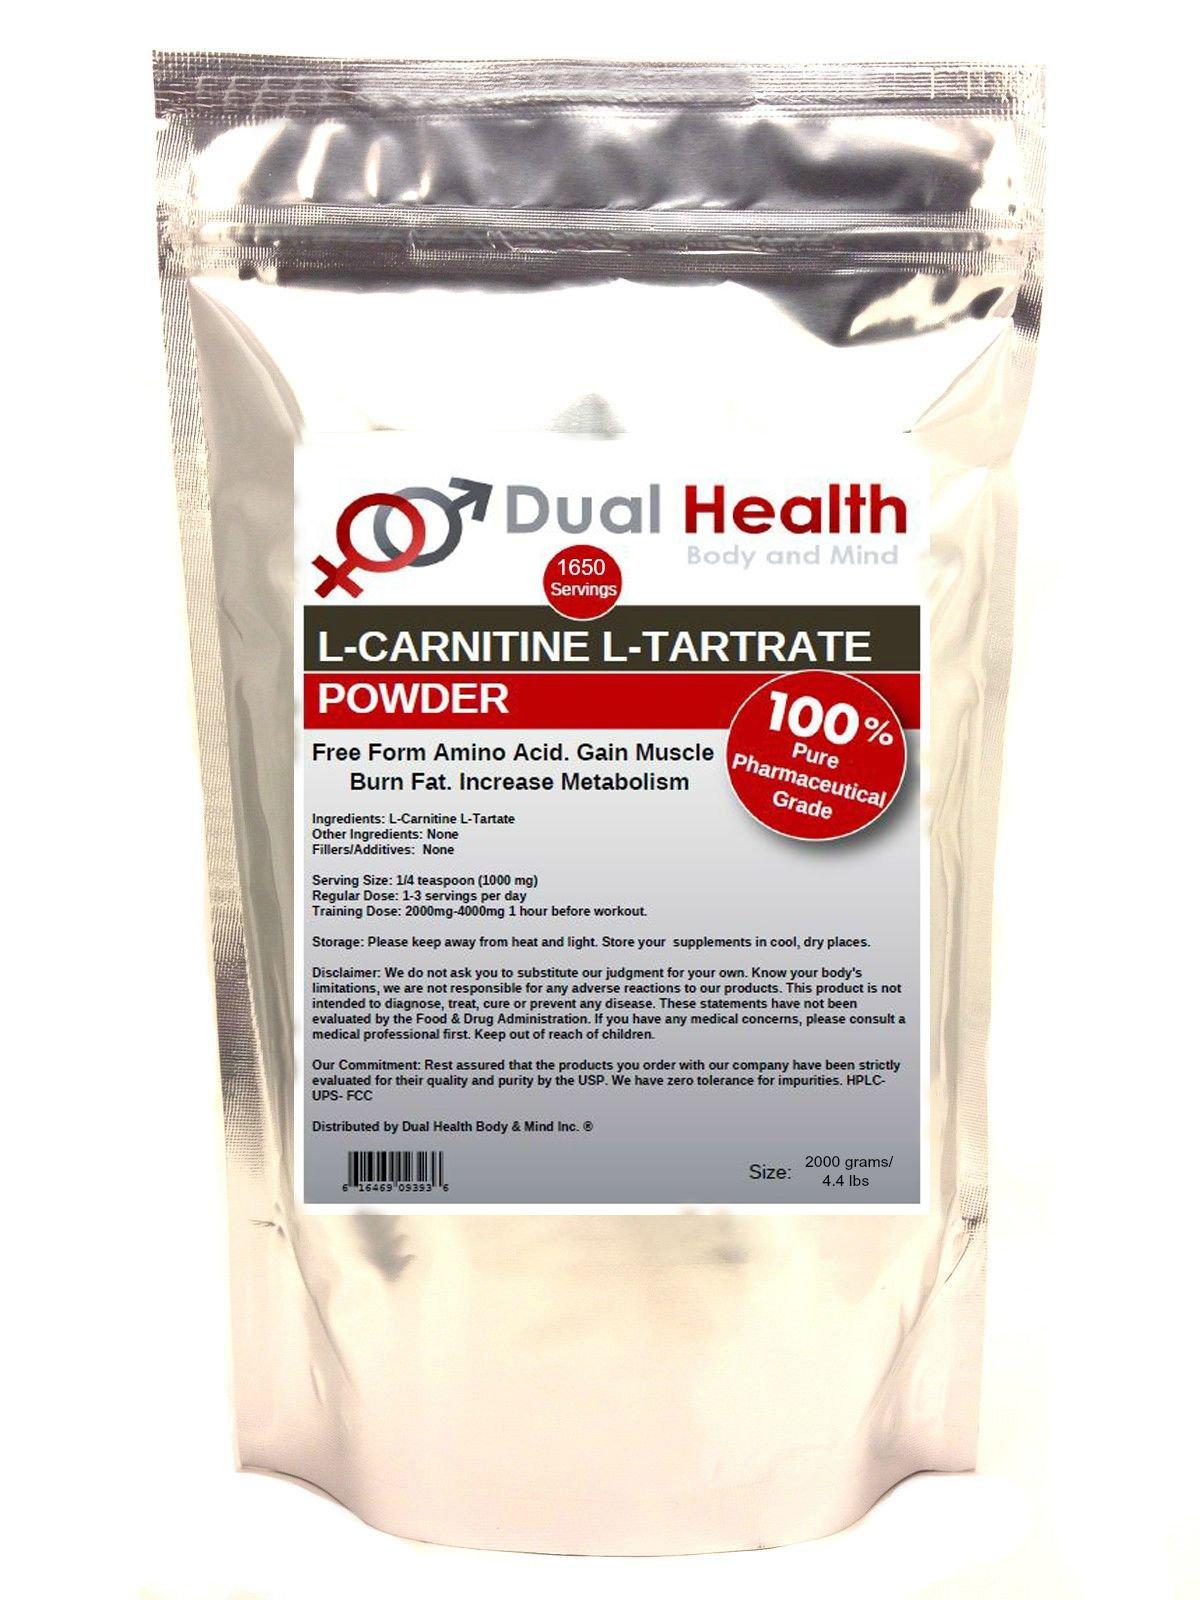 Pure L-Carnitine L-Tartrate Powder (2000 grams (4.4 lbs)) Bulk Supplements